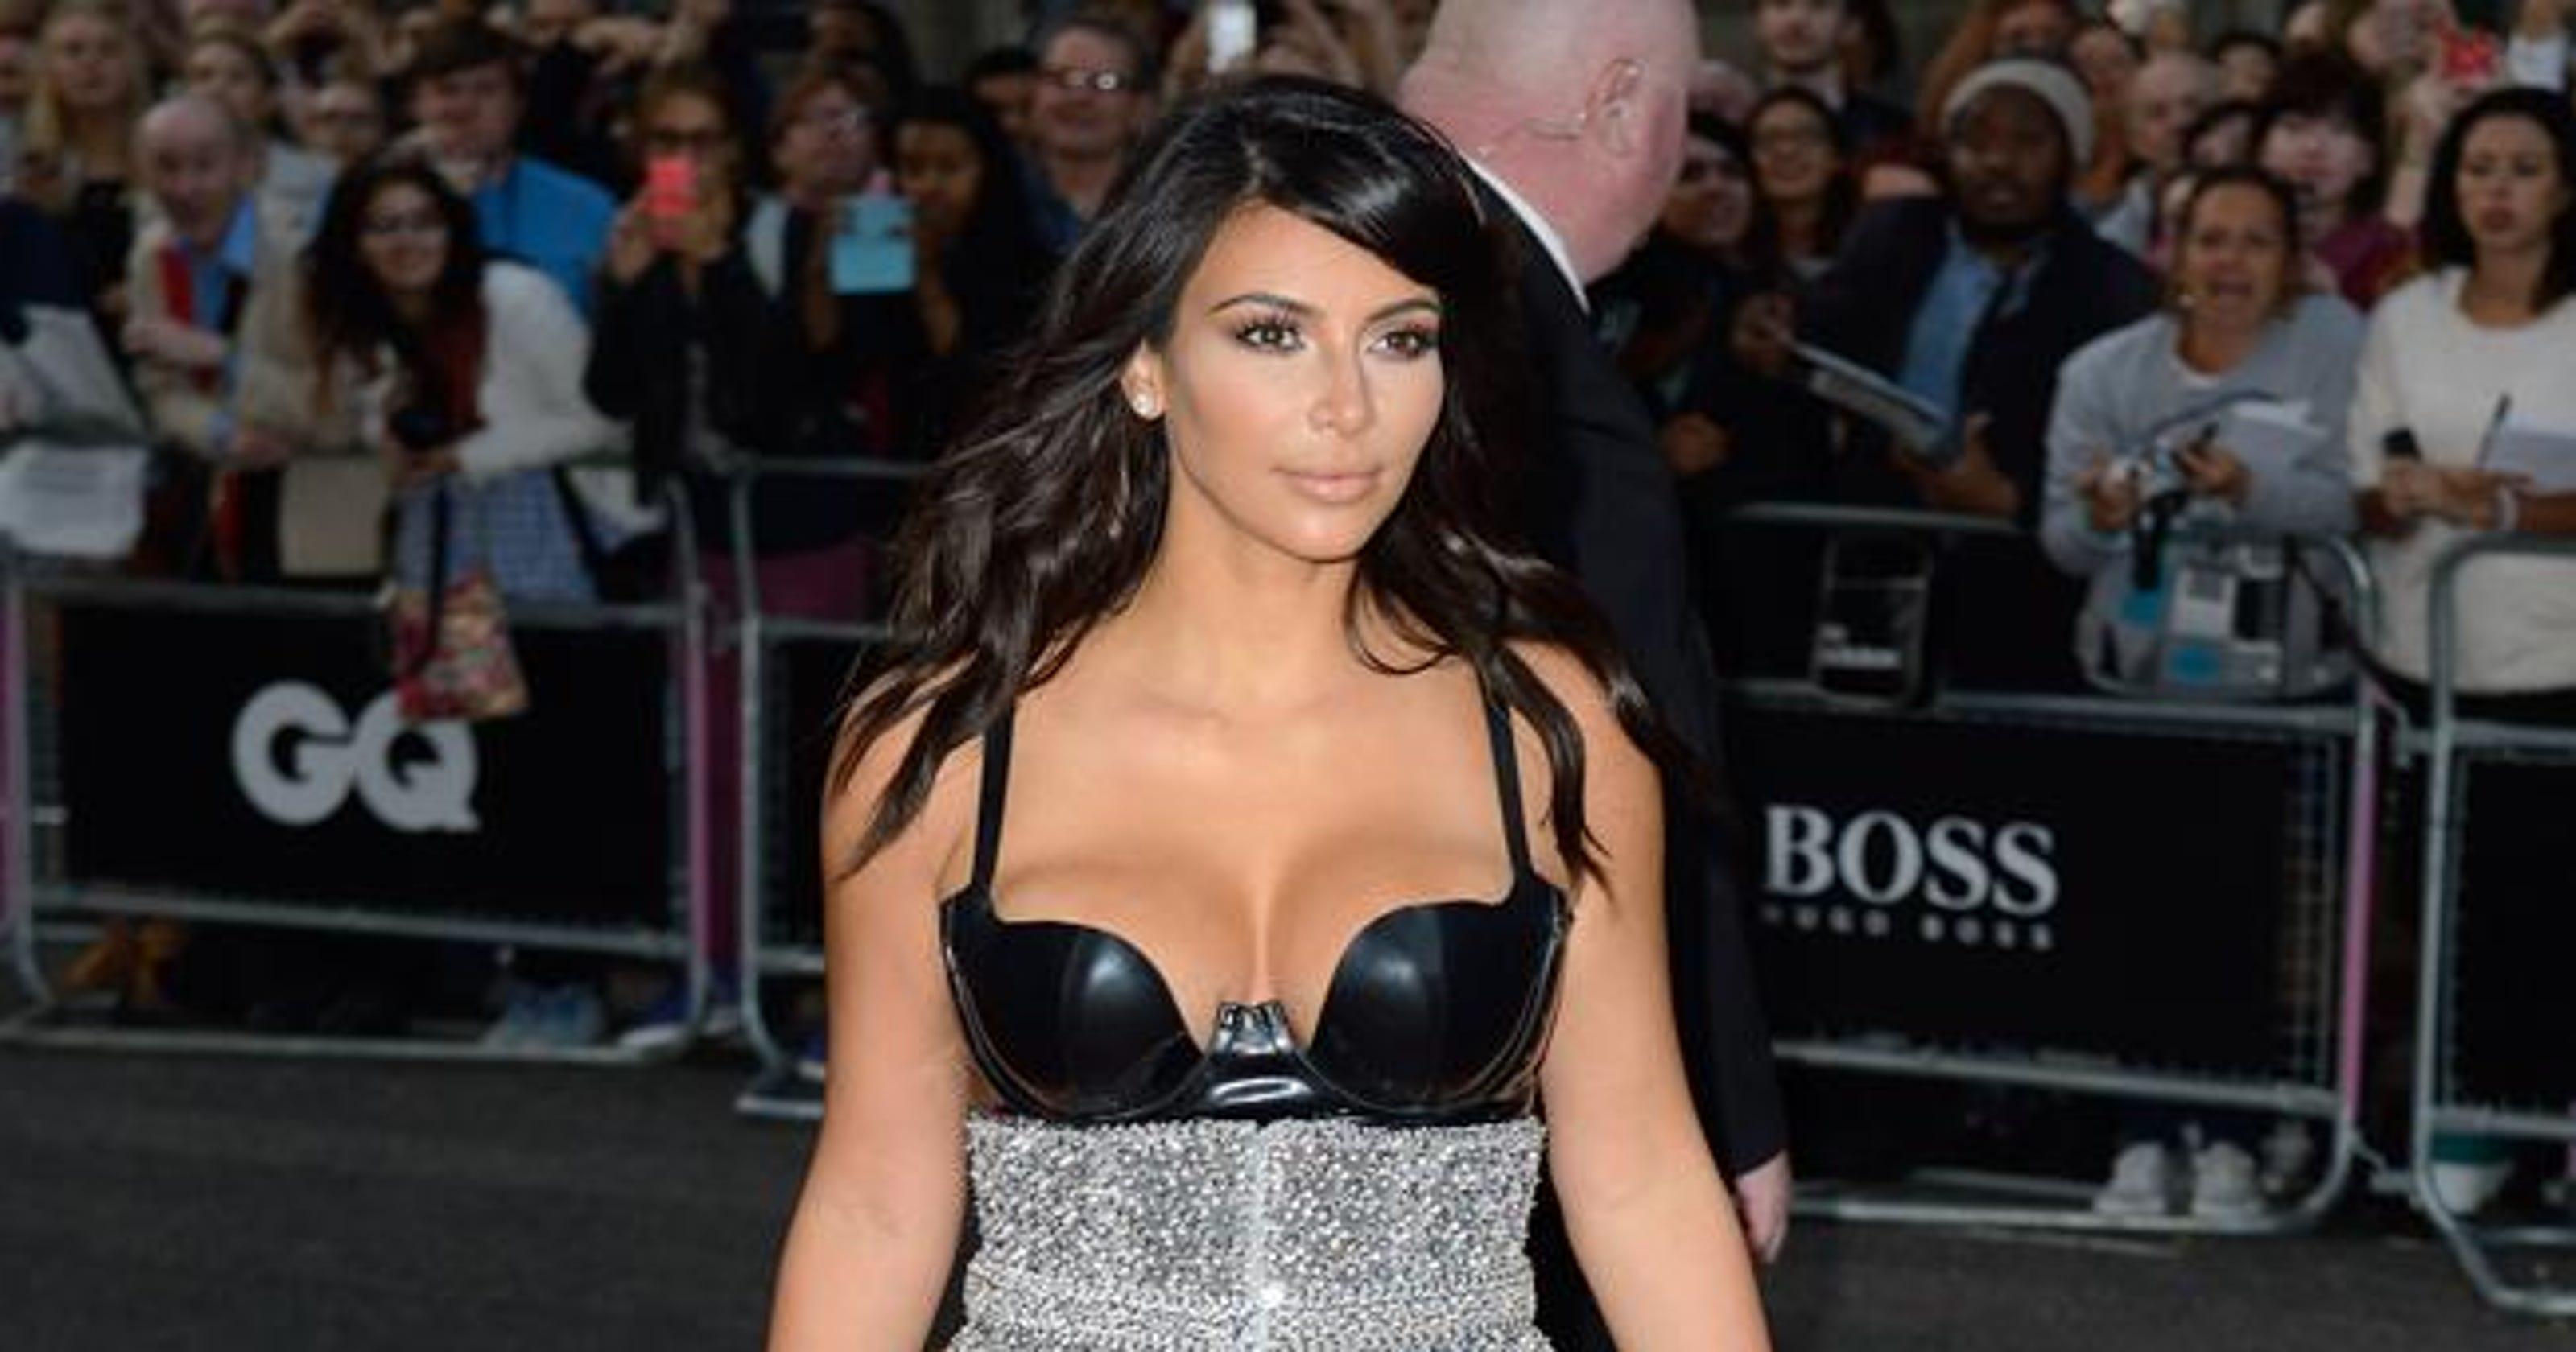 Kim Kardashian Wests Naked Photos Leaked Online